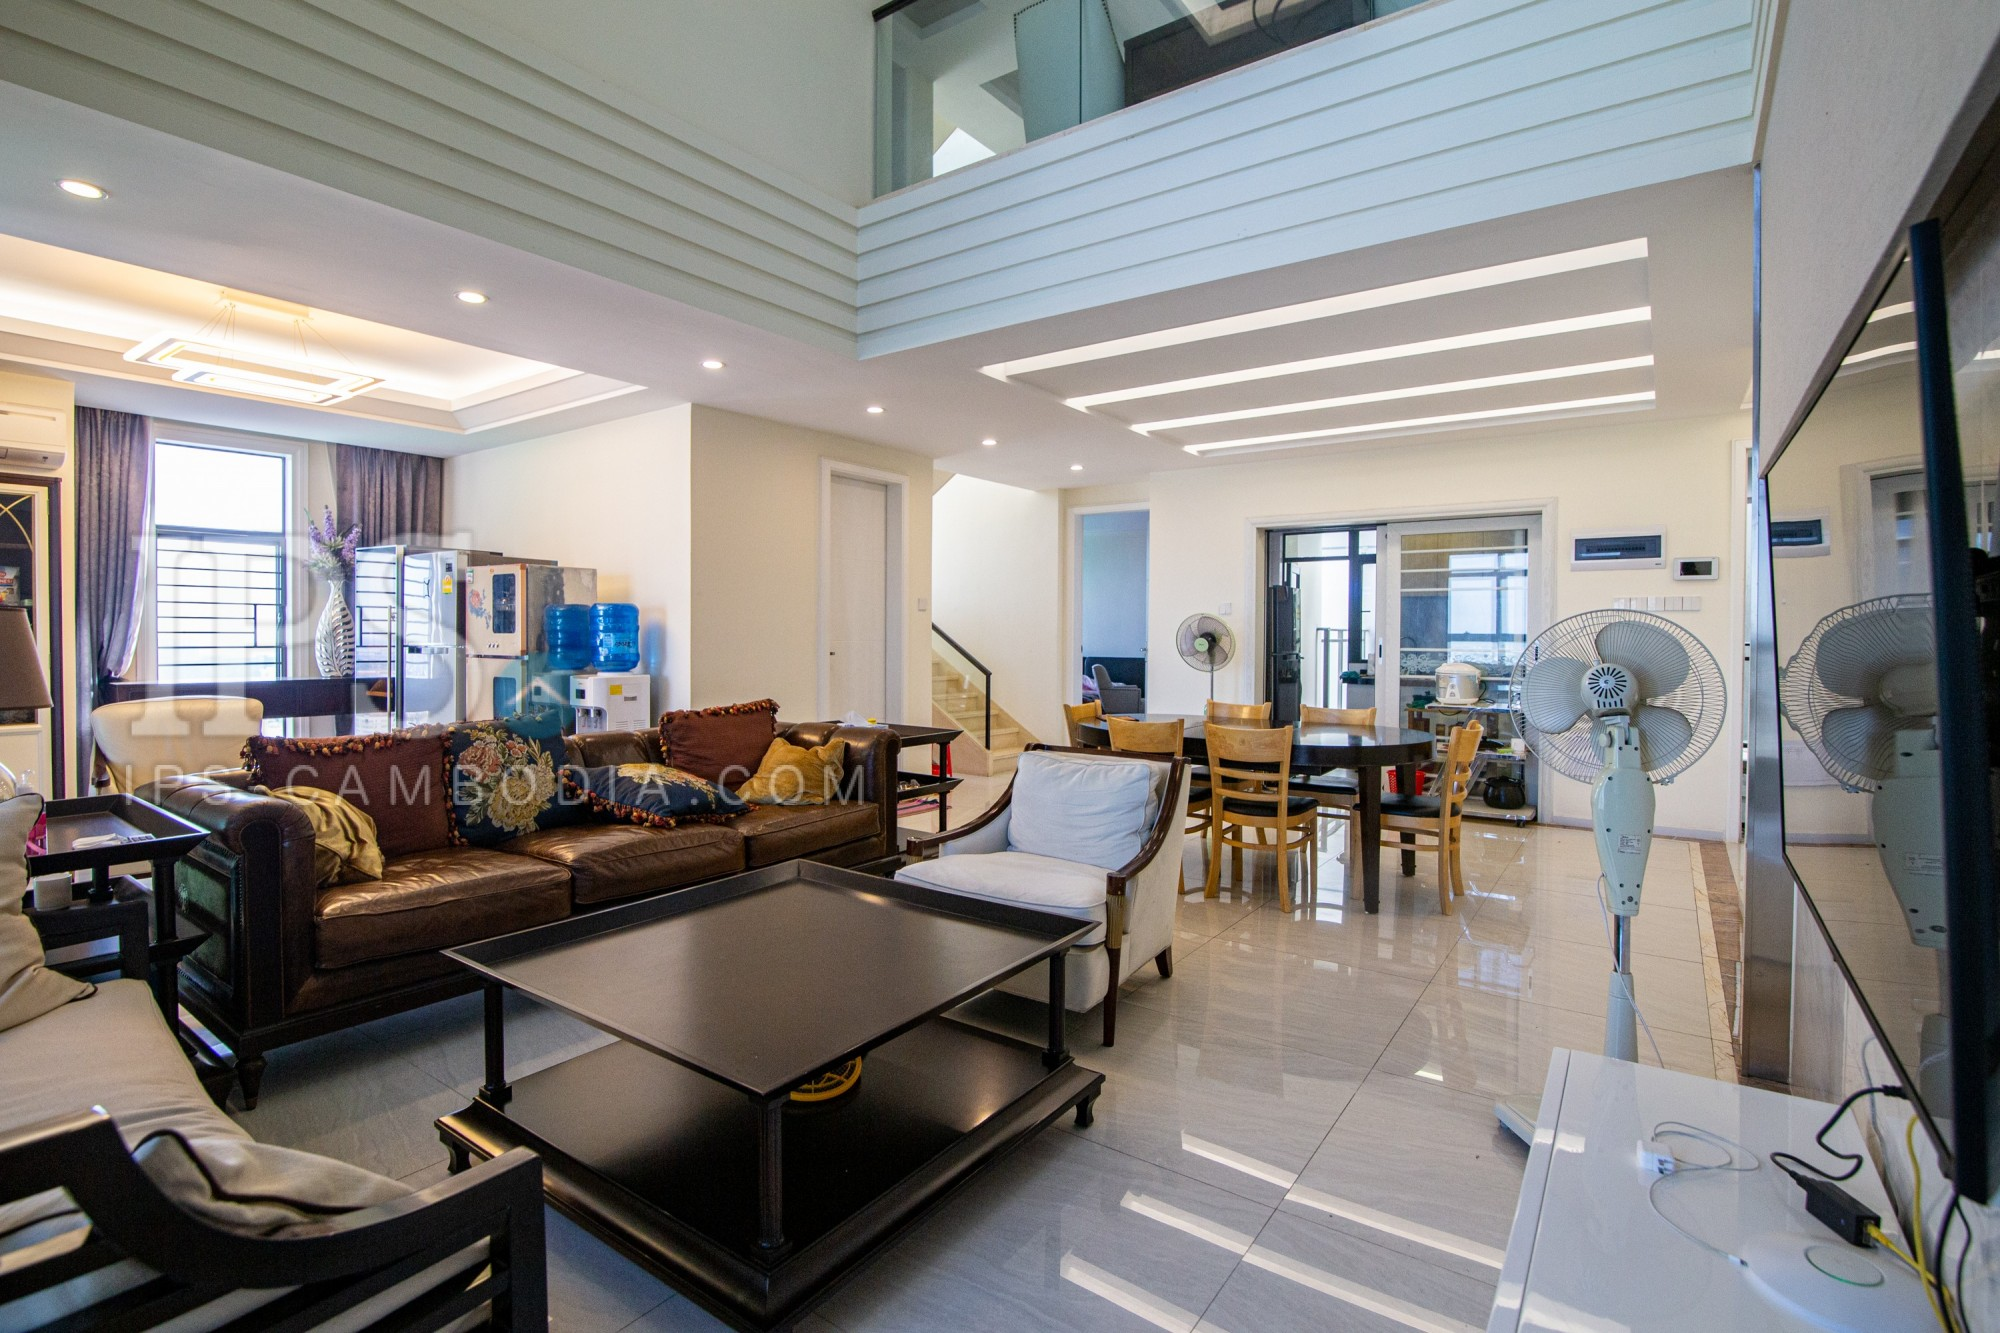 3 Bedroom Duplex Penthouse For Sale - Toul Kork, Phnom Penh